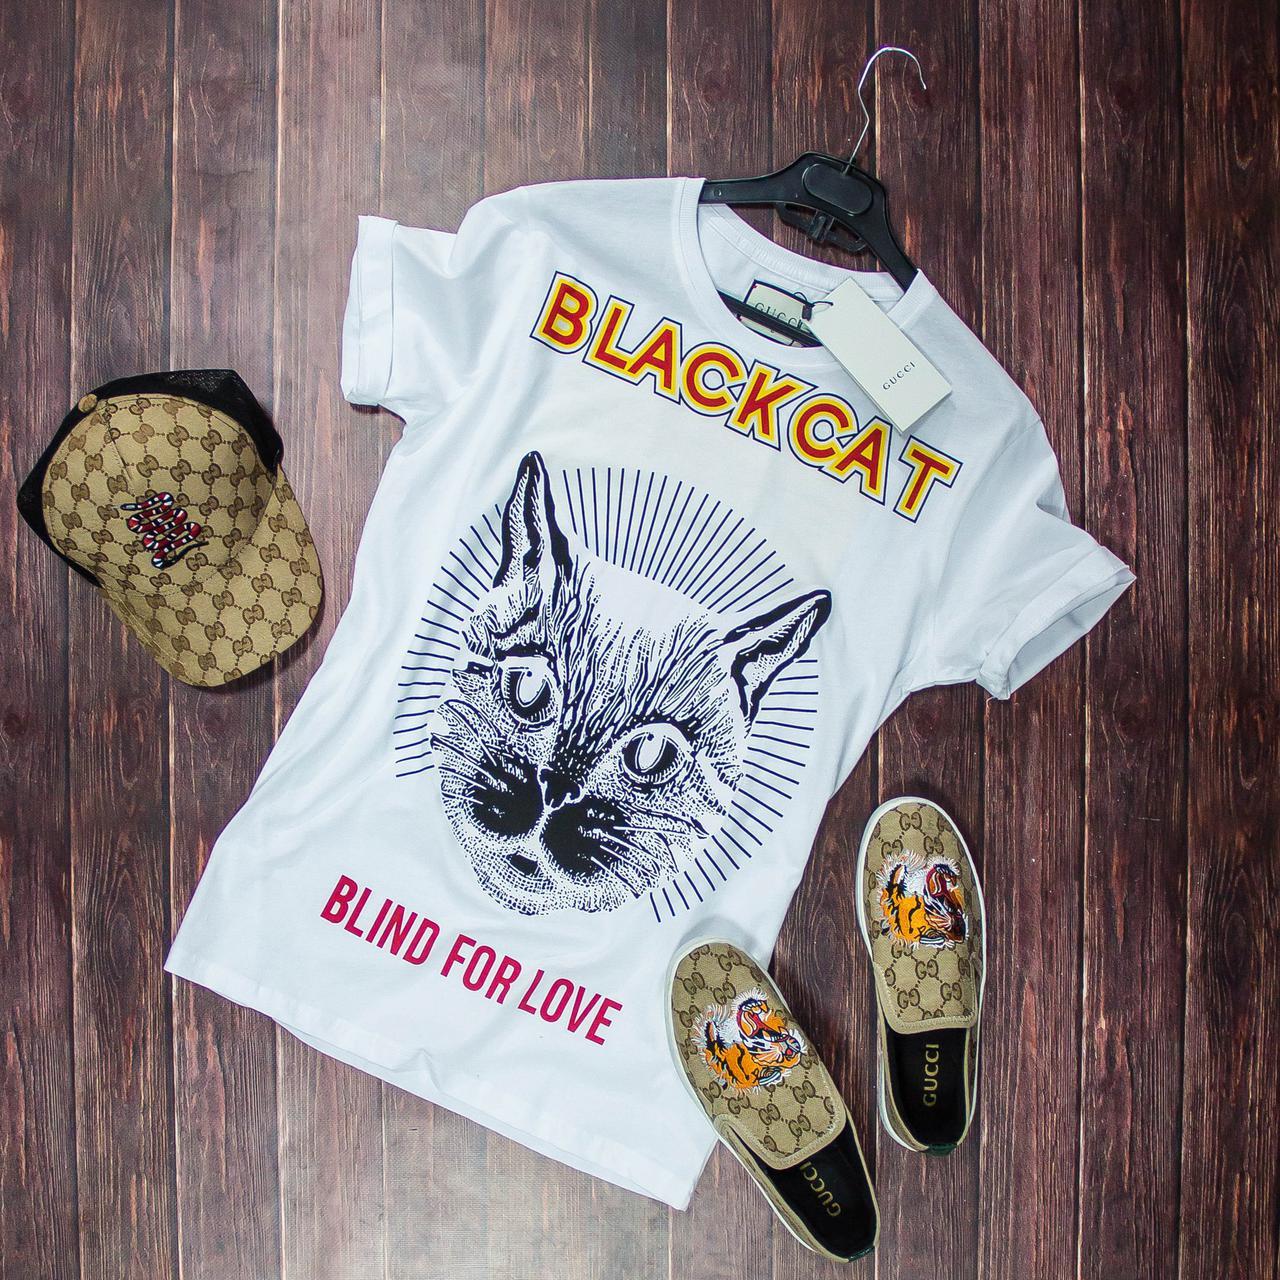 fb7c083302c8 Футболка Gucci BlackCat, Реплика, цена 720 грн., купить в Львове ...